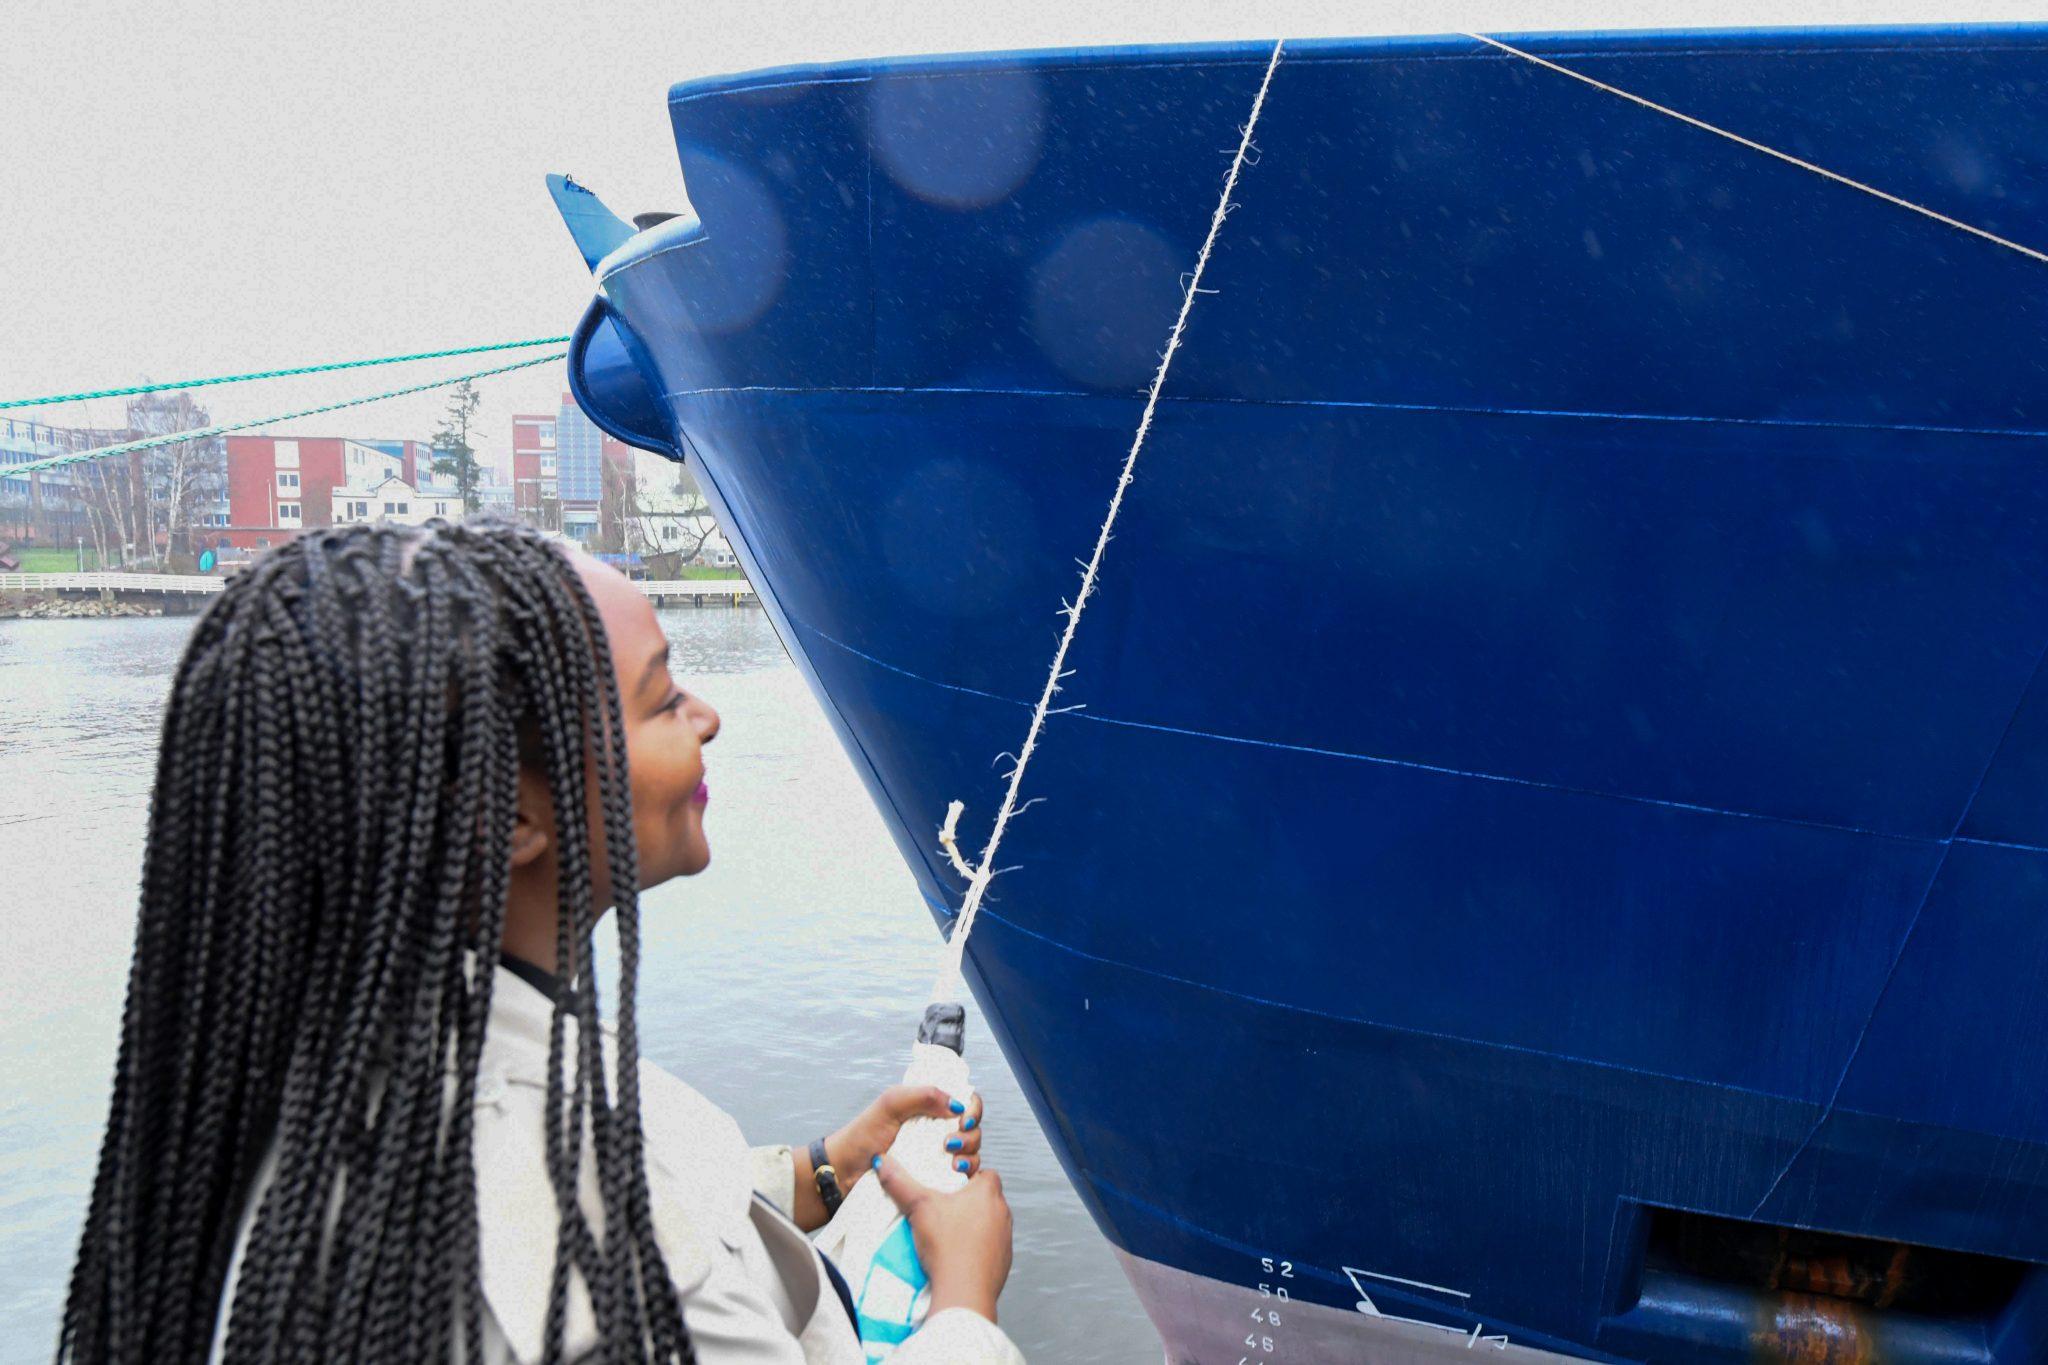 Taufe Rettungsschiff Sea-Watch 4